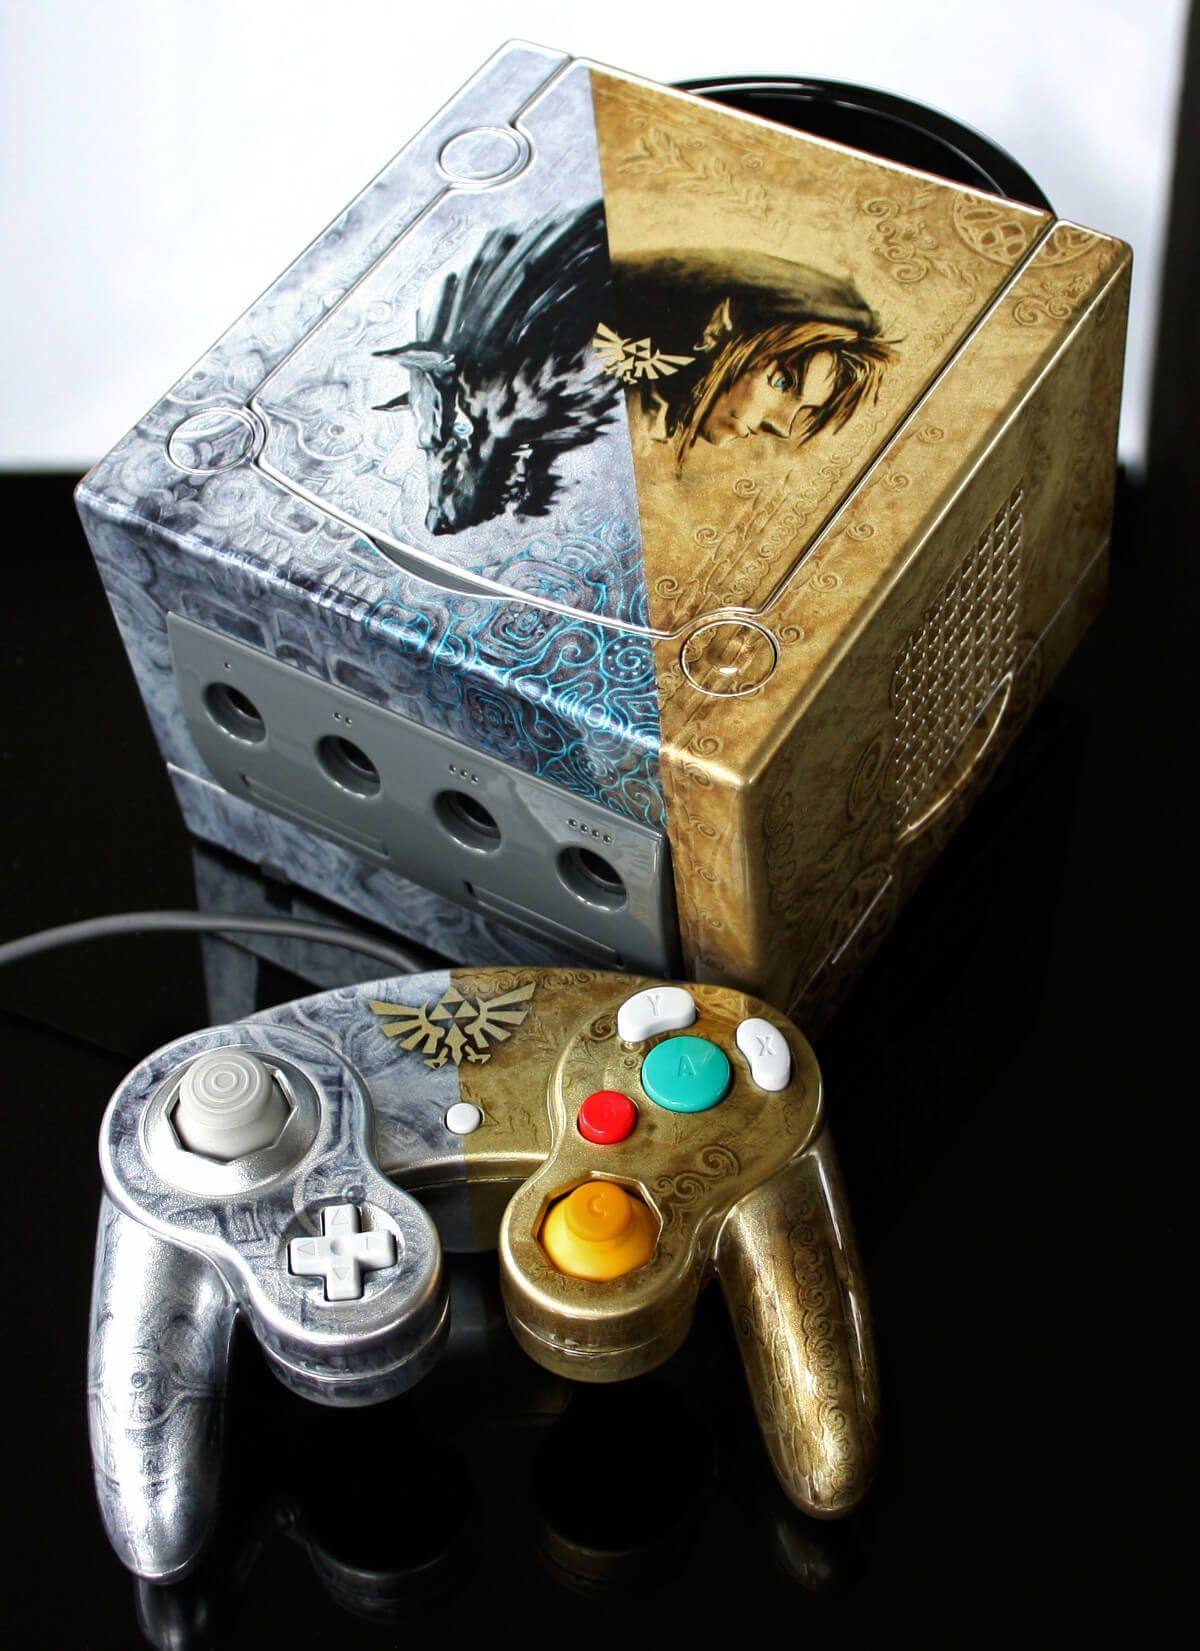 Pin by CJ JHONSON on Nintendo Zelda twilight princess